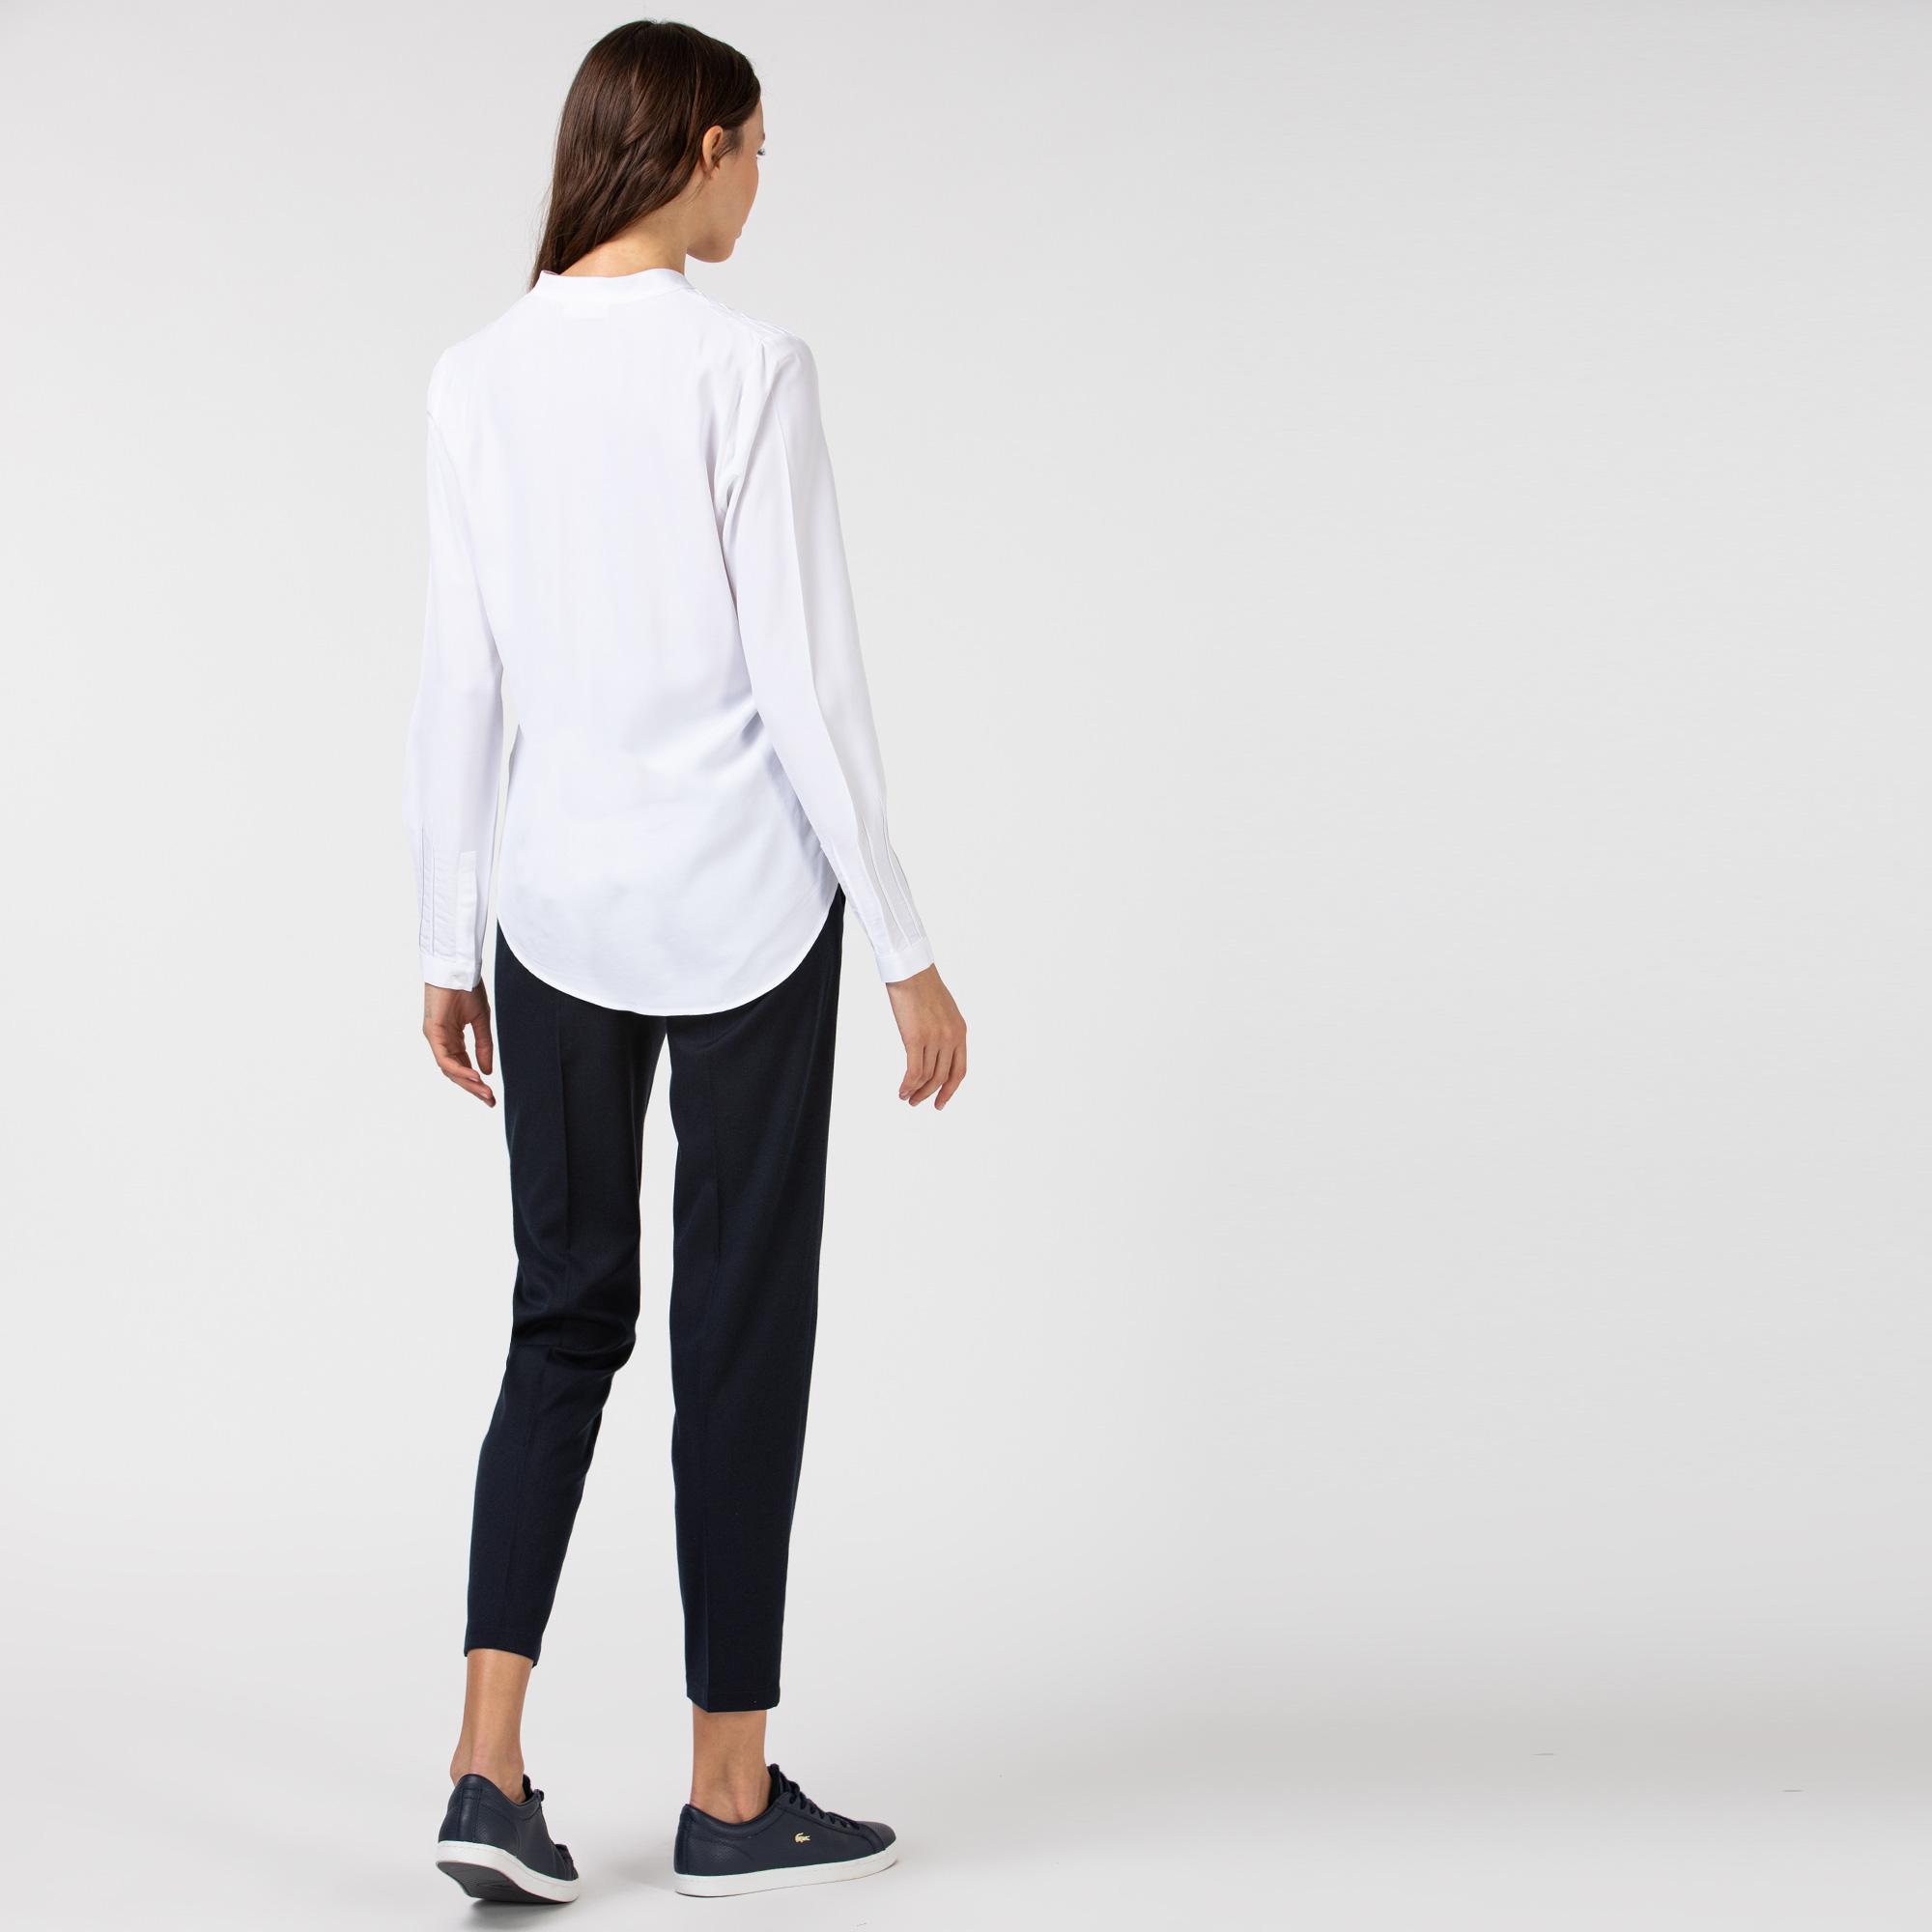 Lacoste Women's Proto Fit Trousers